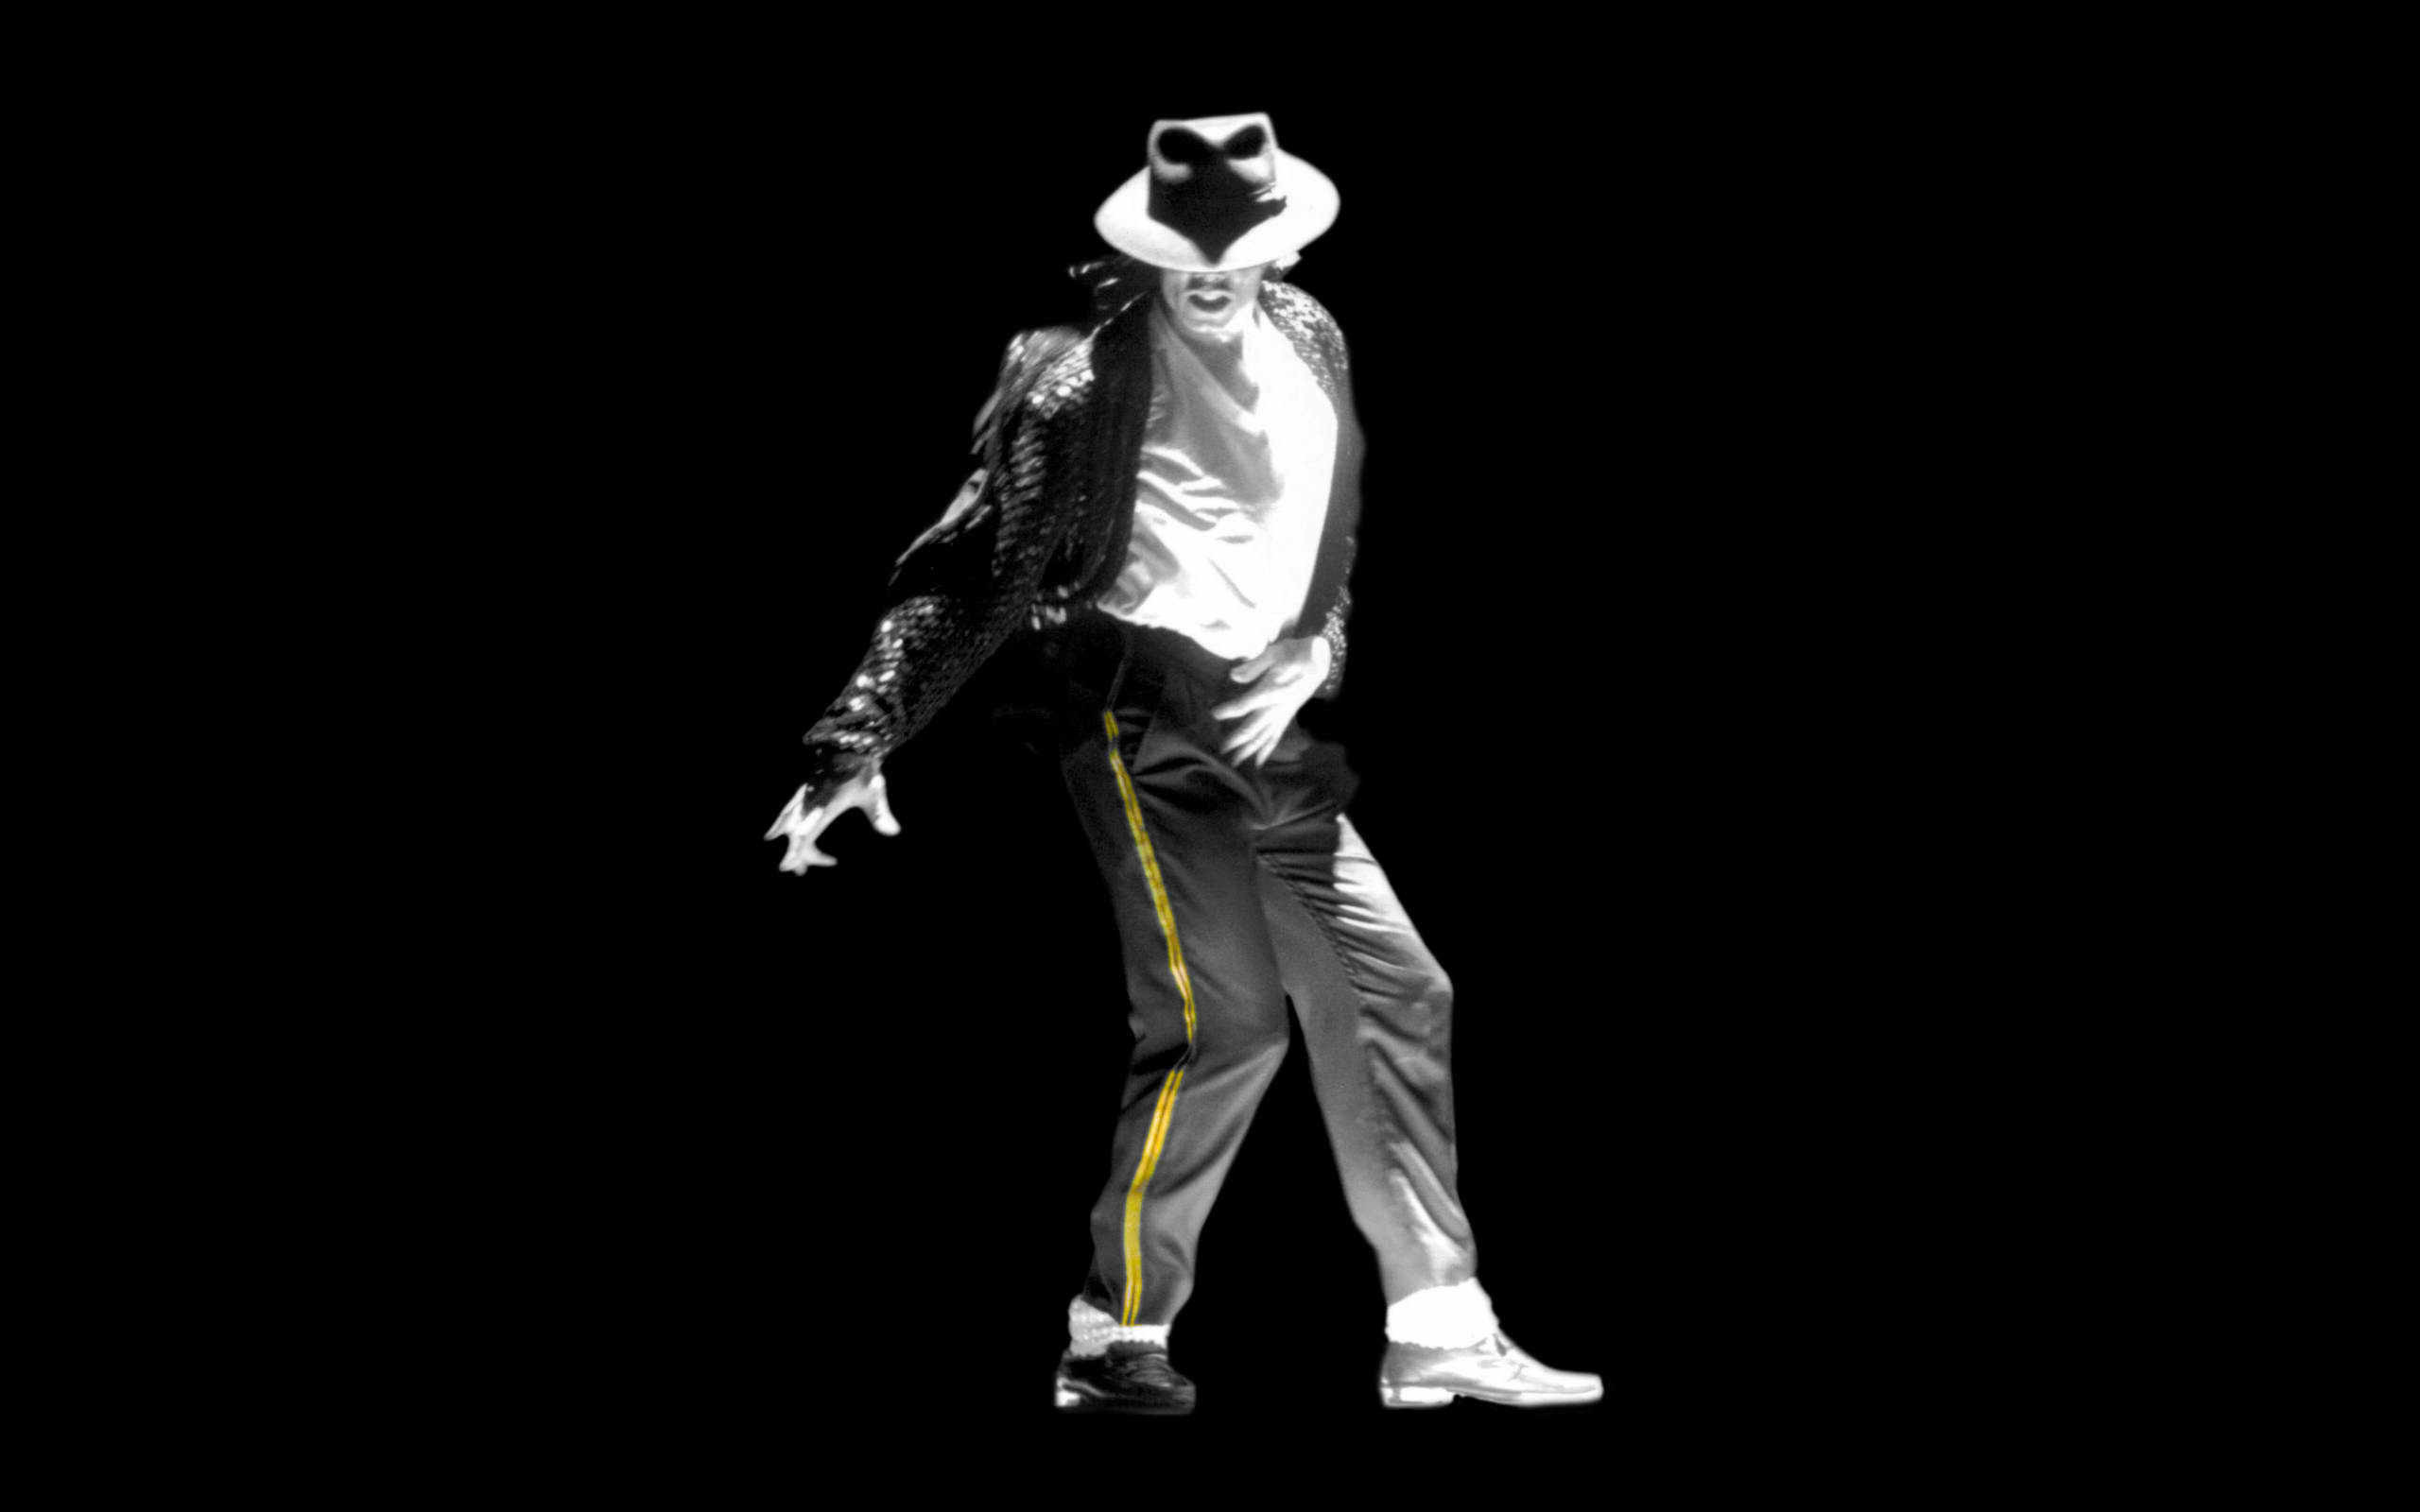 Michael Jackson Hd Wallpaper 80 Pictures